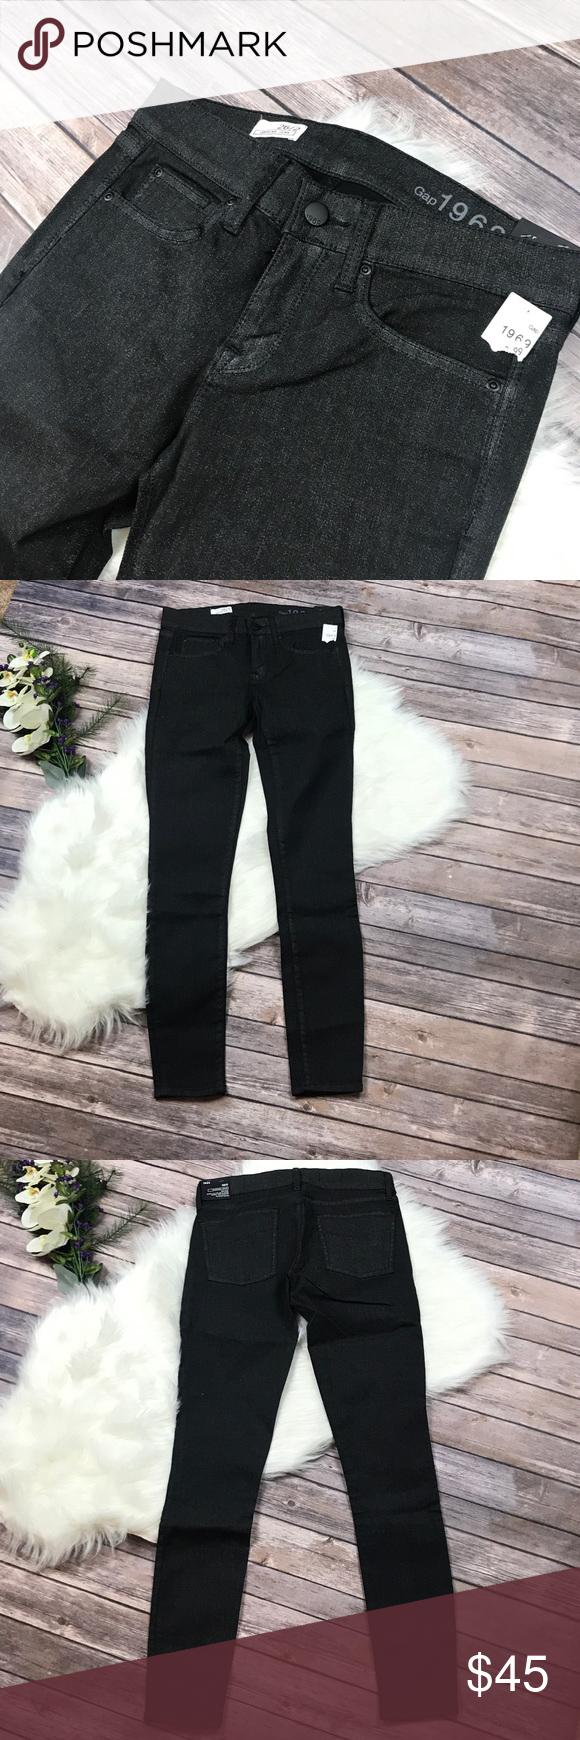 GAP 1969 Glitter Jeans GAP 1969 Black Glitter Skinny Jeans